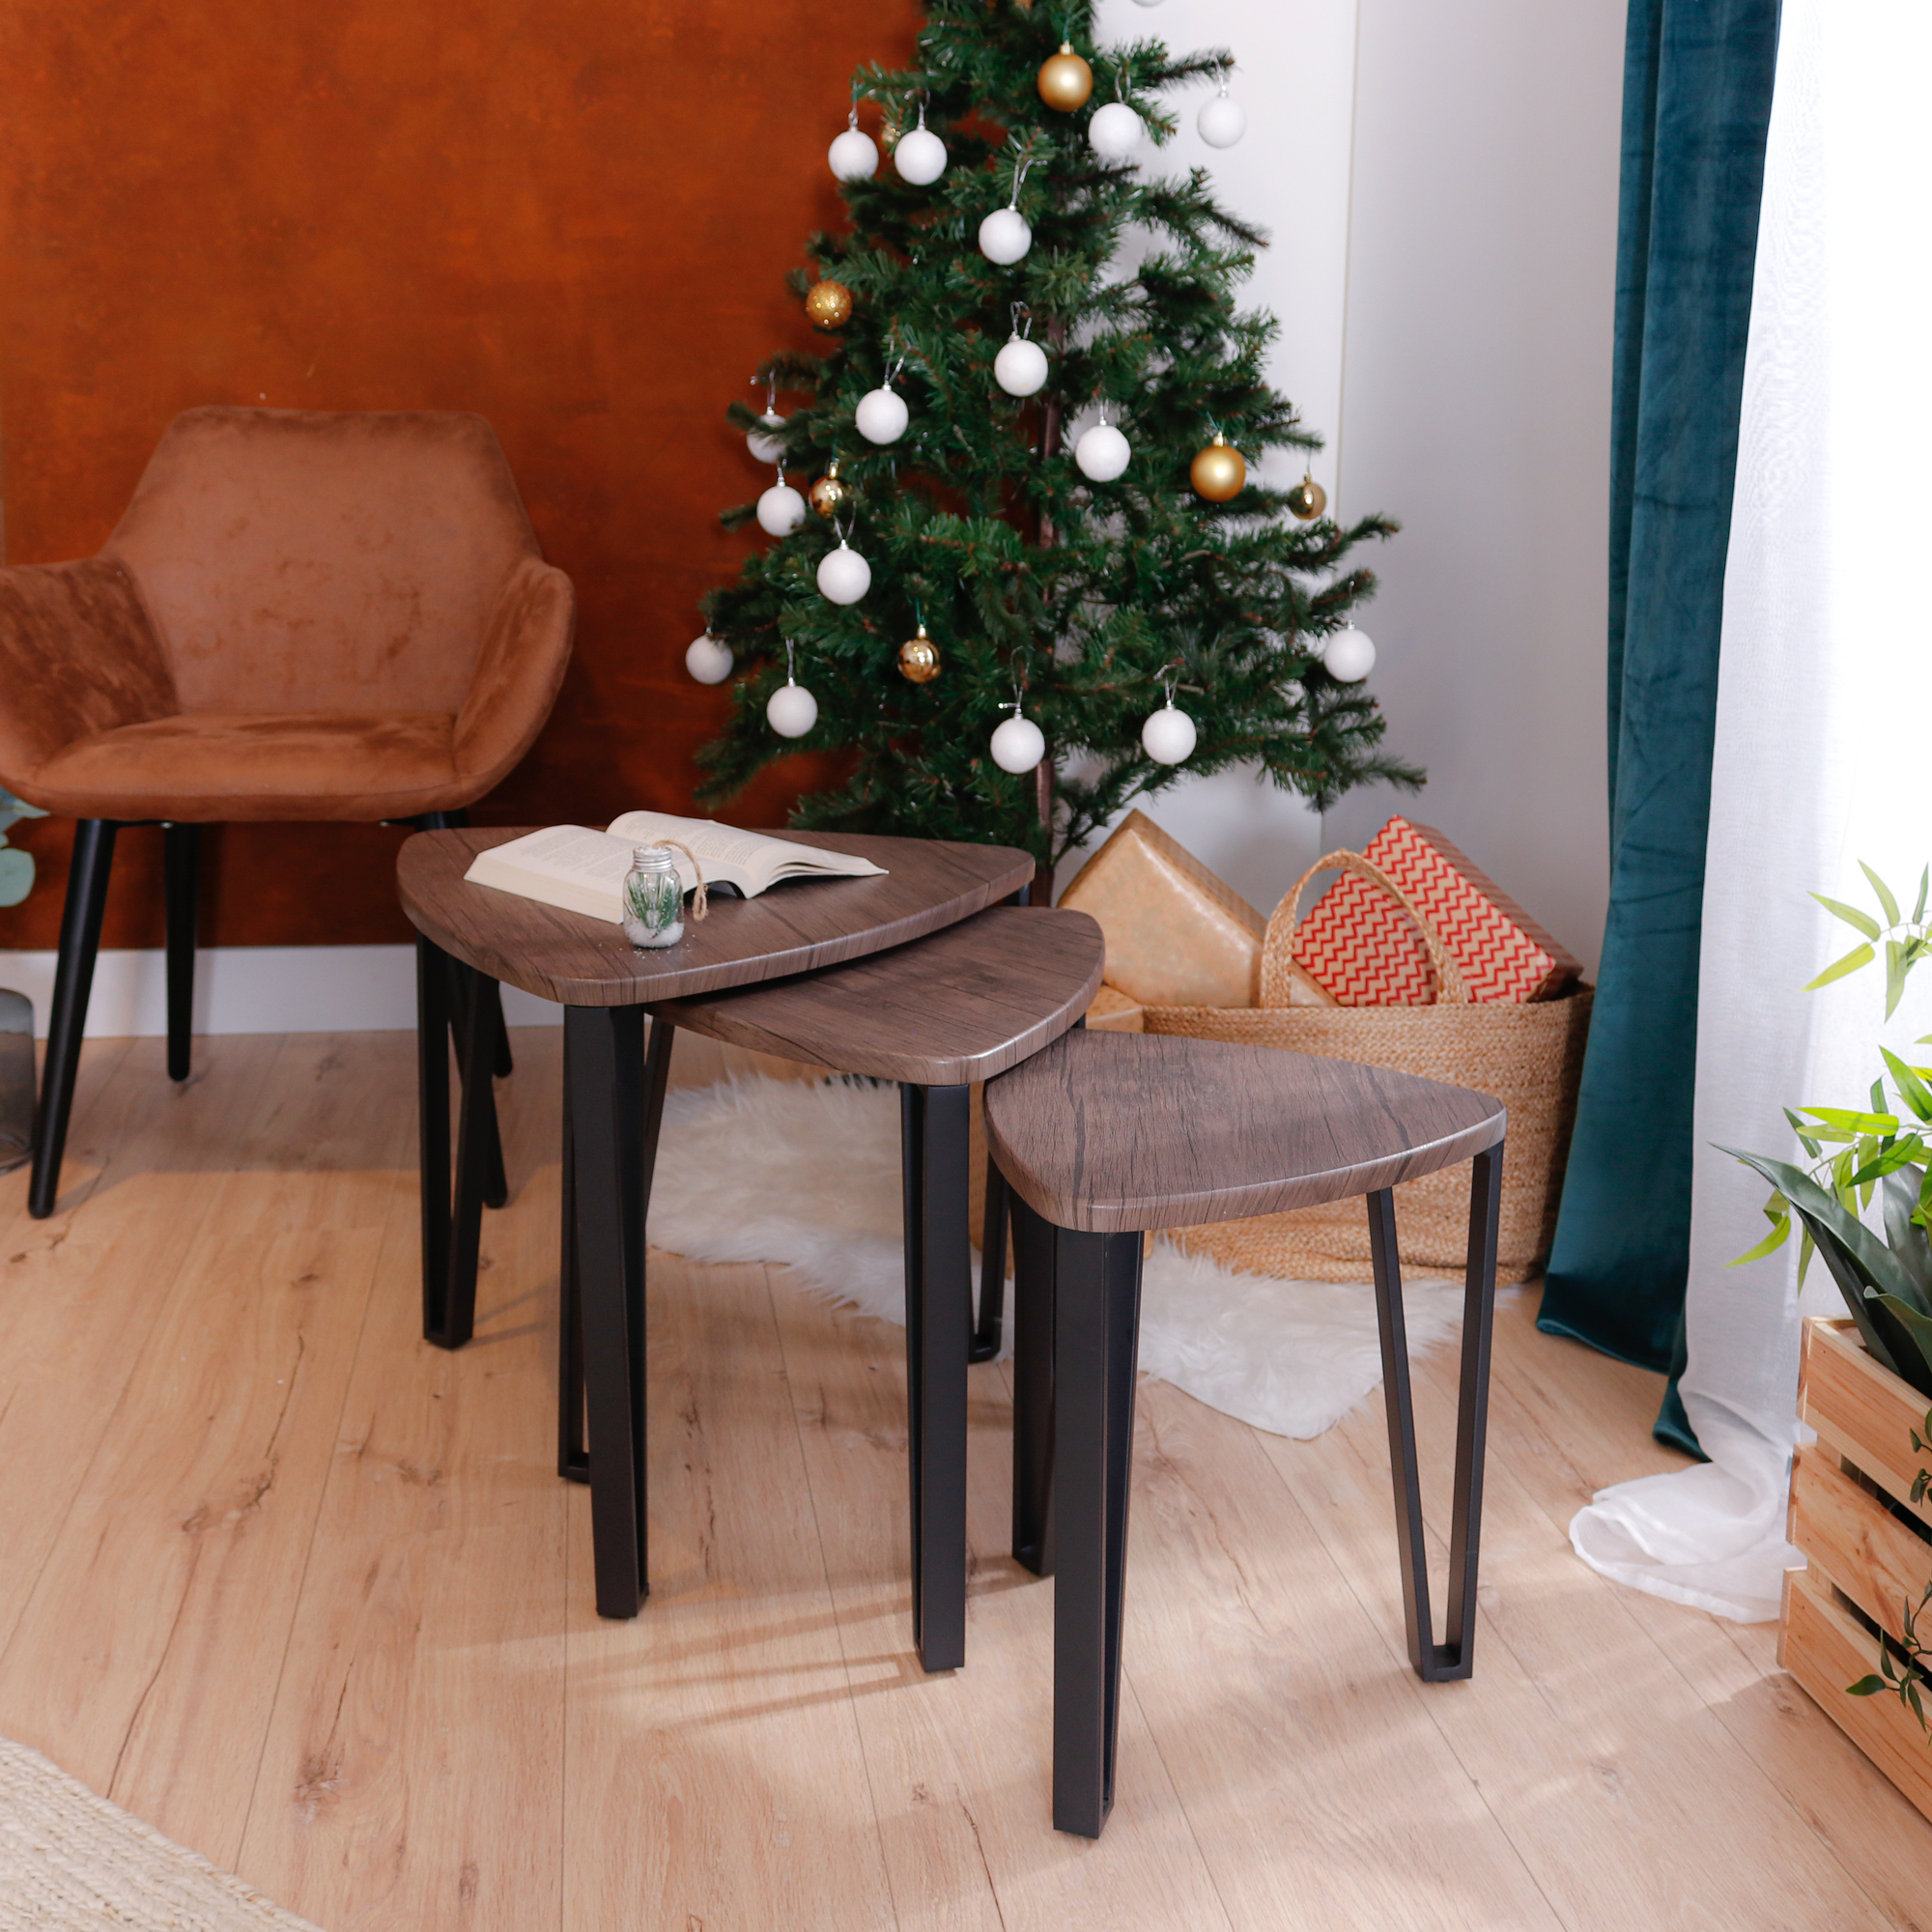 furniturer stacking side table set of 3 nesting triangle end coffee tables vintage brown walmart com walmart com